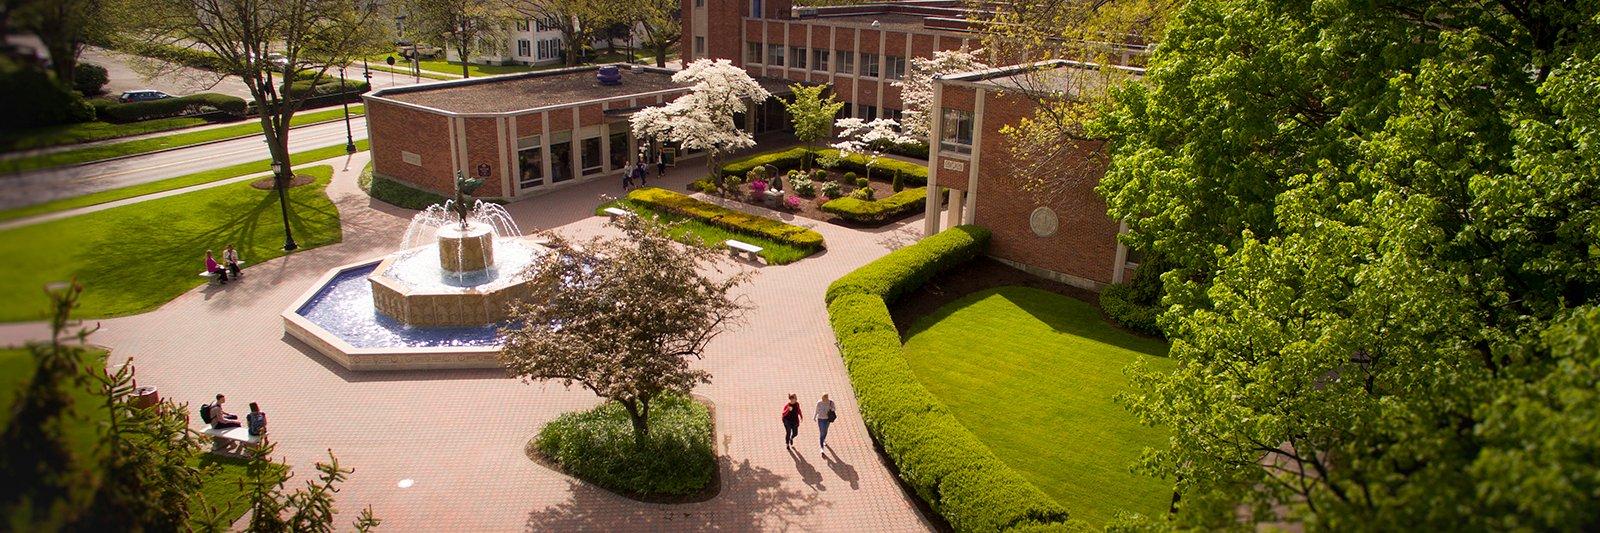 Elmira College's official Twitter account